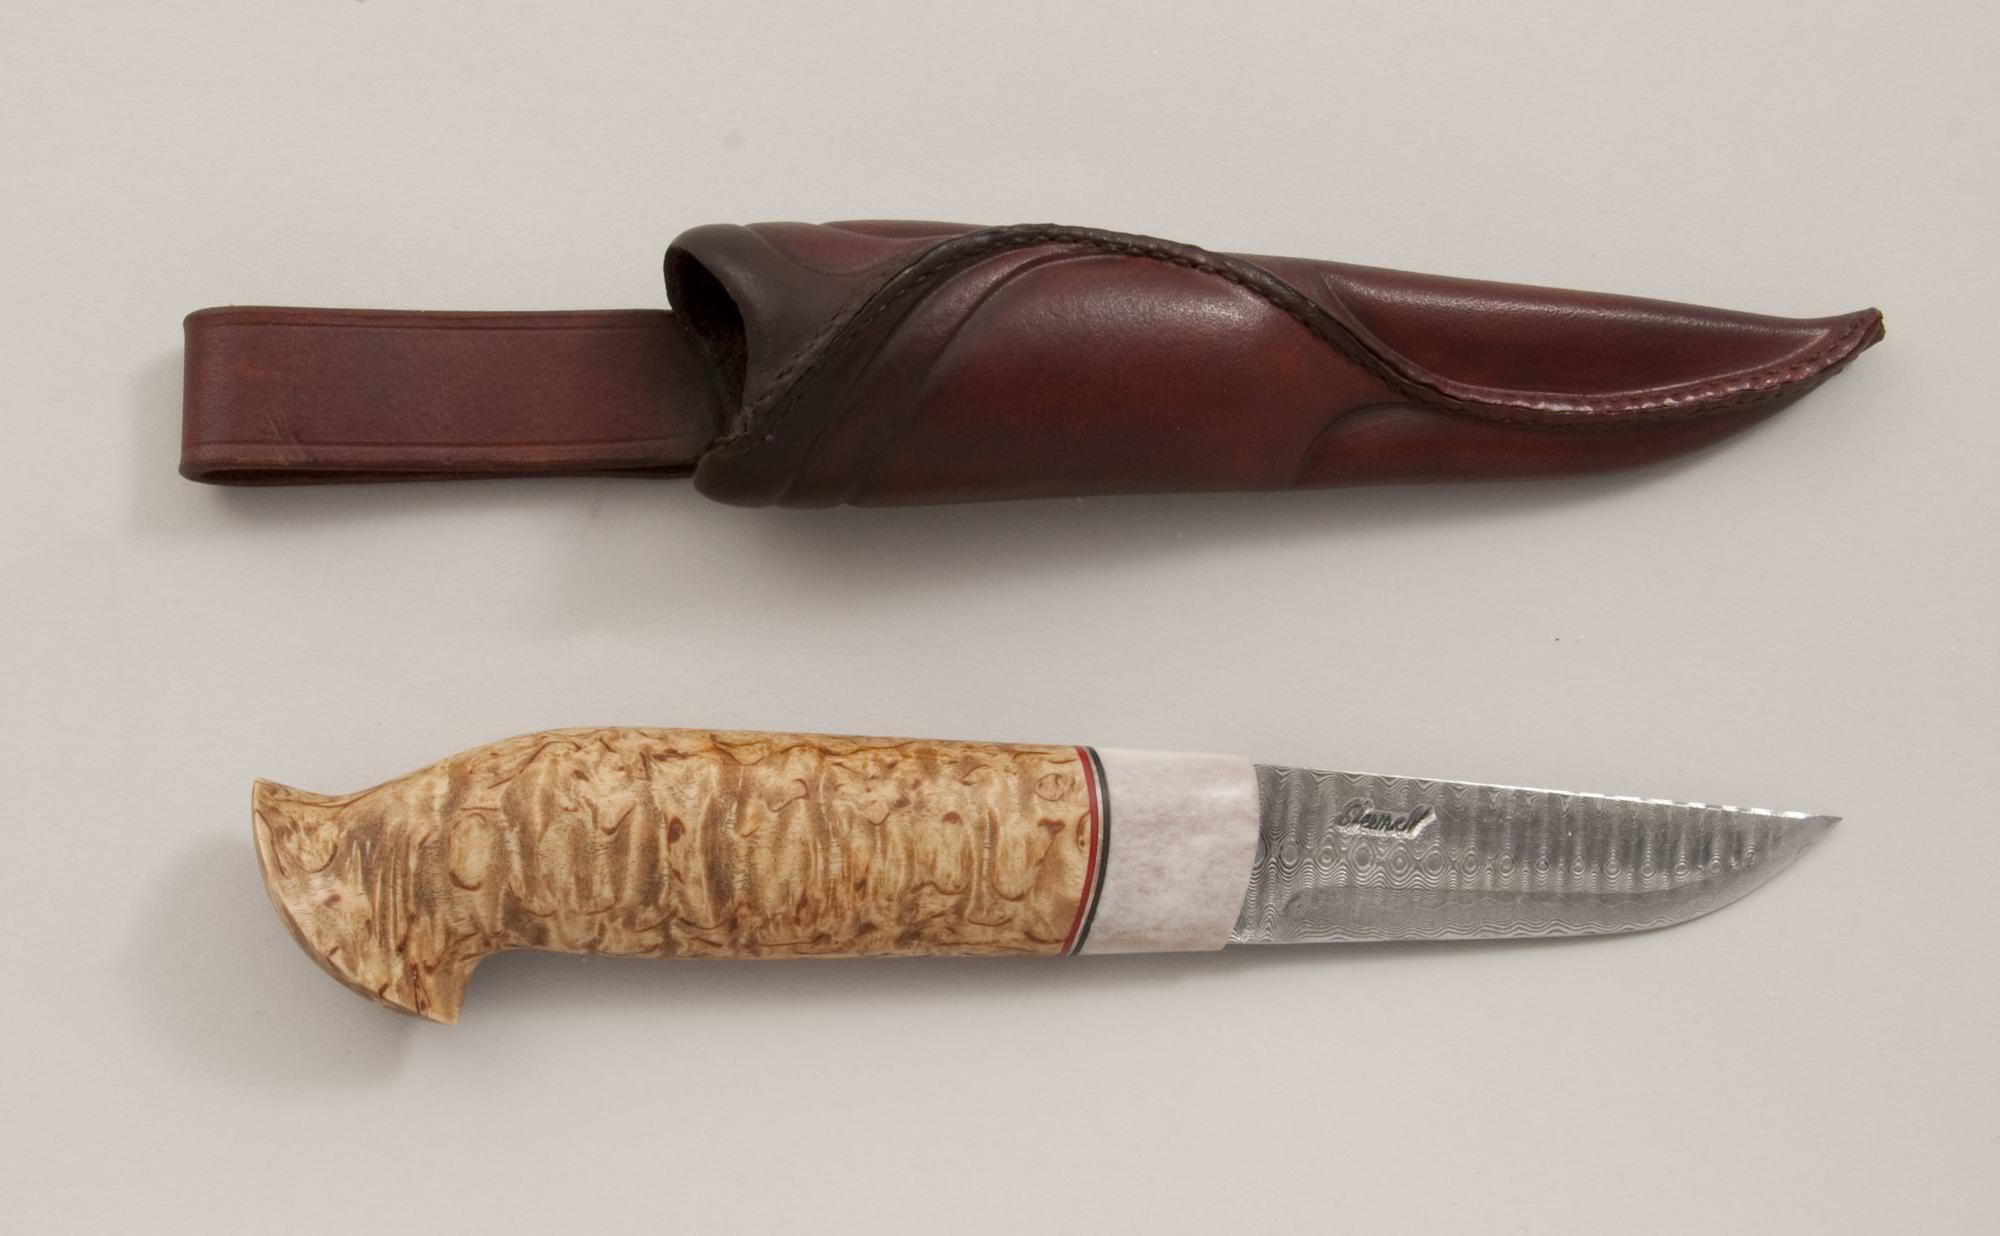 Knife with birch handle © 2010 Bruce Knutsen Knife with birch handle © 2010 Bruce Knutsen